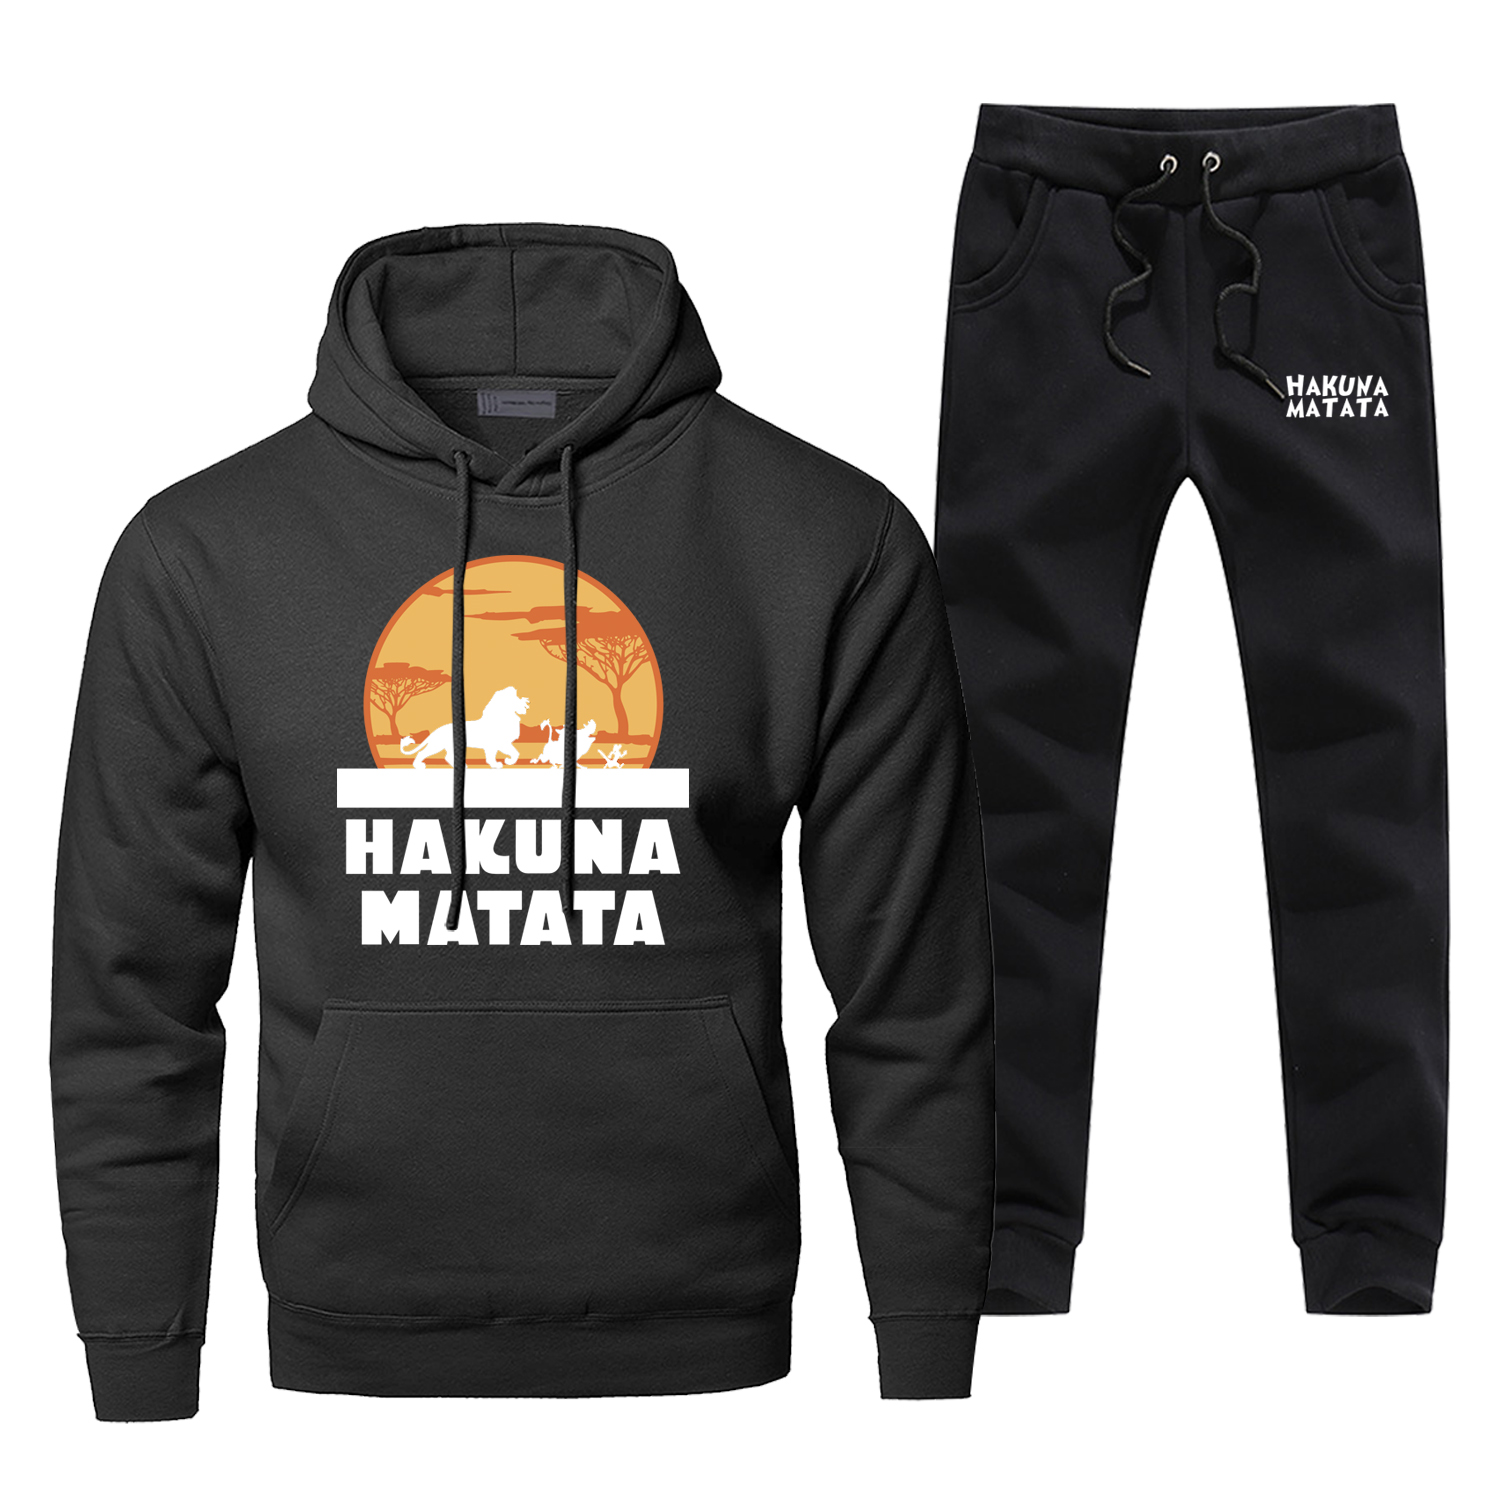 Hoodie Pants Set The Lion King Hakune Matata Men Sweatshirt Male Hoodies Sweatshirts Mens Sets Two Piece Pant Pullover Hood Coat